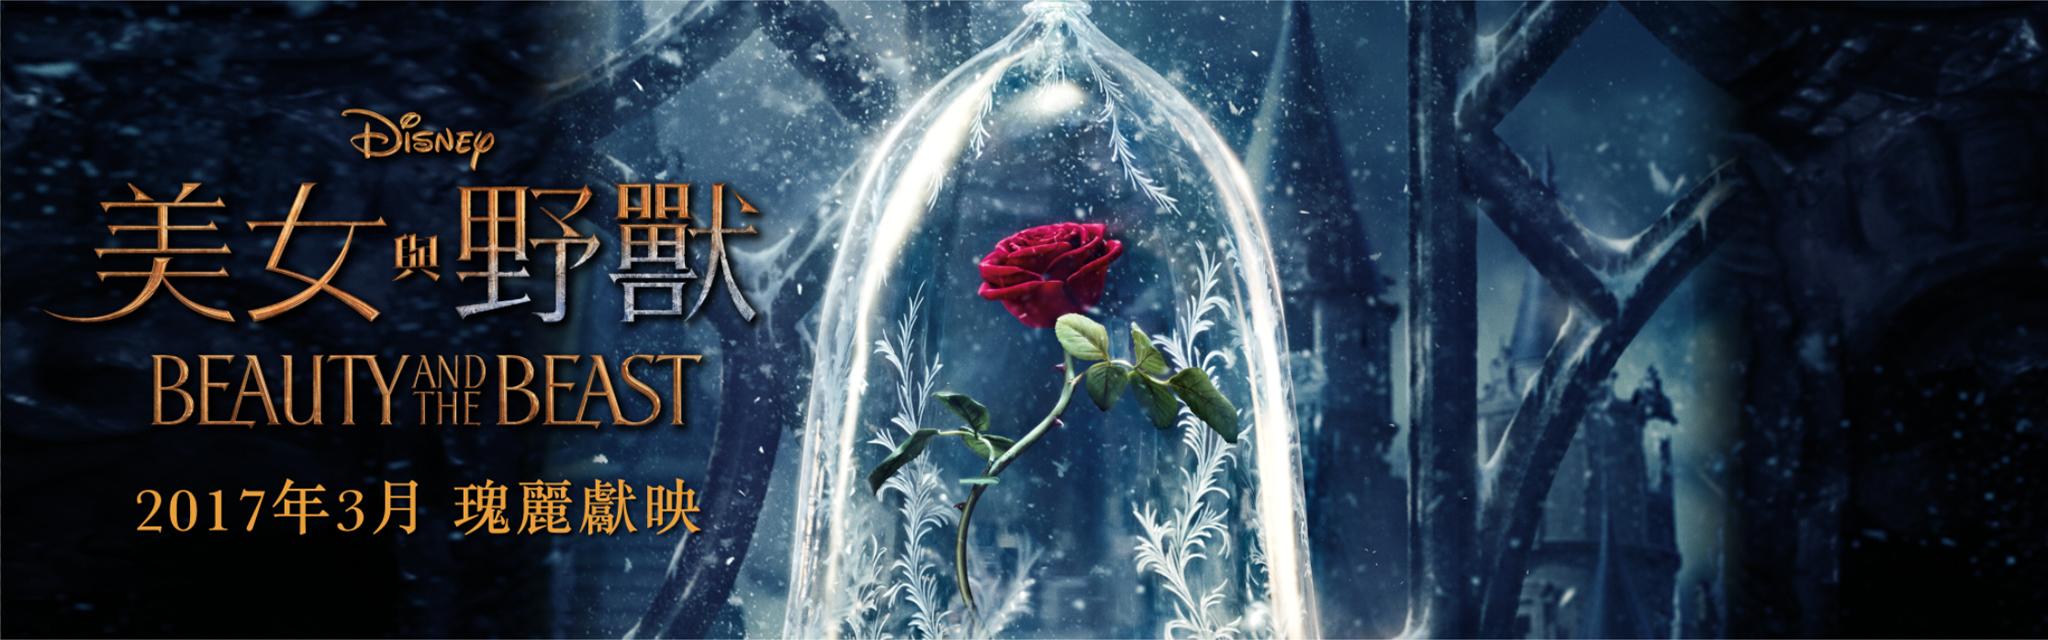 Beauty and the Beast - Disney HK